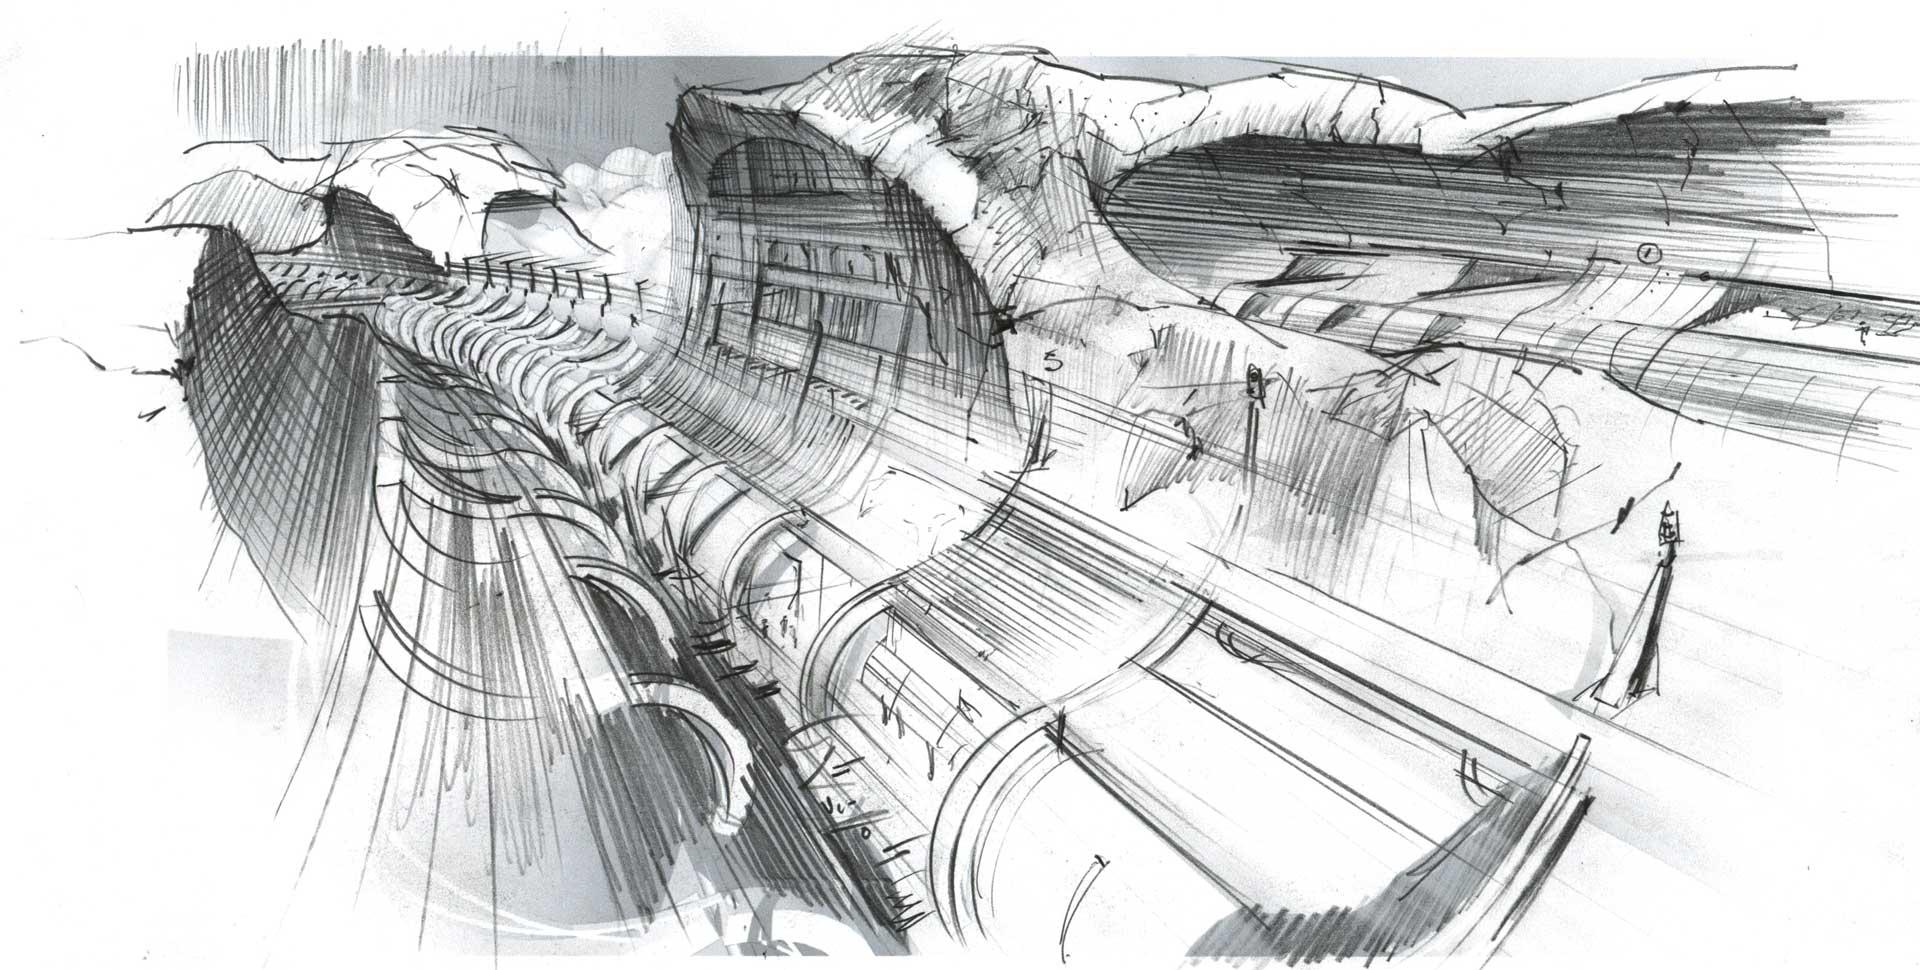 Cross Martian Corridor - Exposed tunnel segment by valles Marineris toward europa.